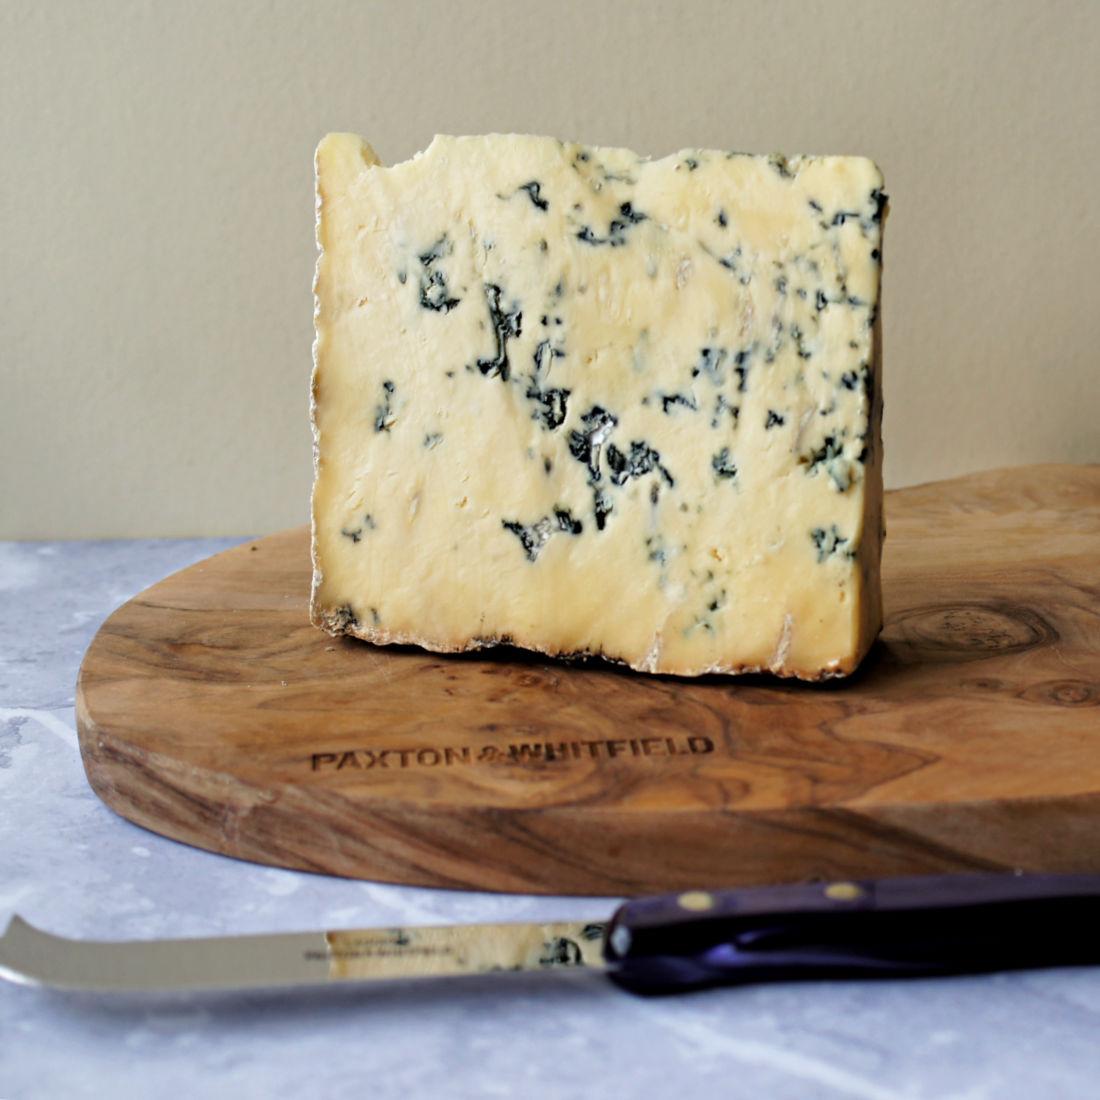 160-Stilton-Hand-Cut-Cheese-Low-ResSh6c1X30SHtsY